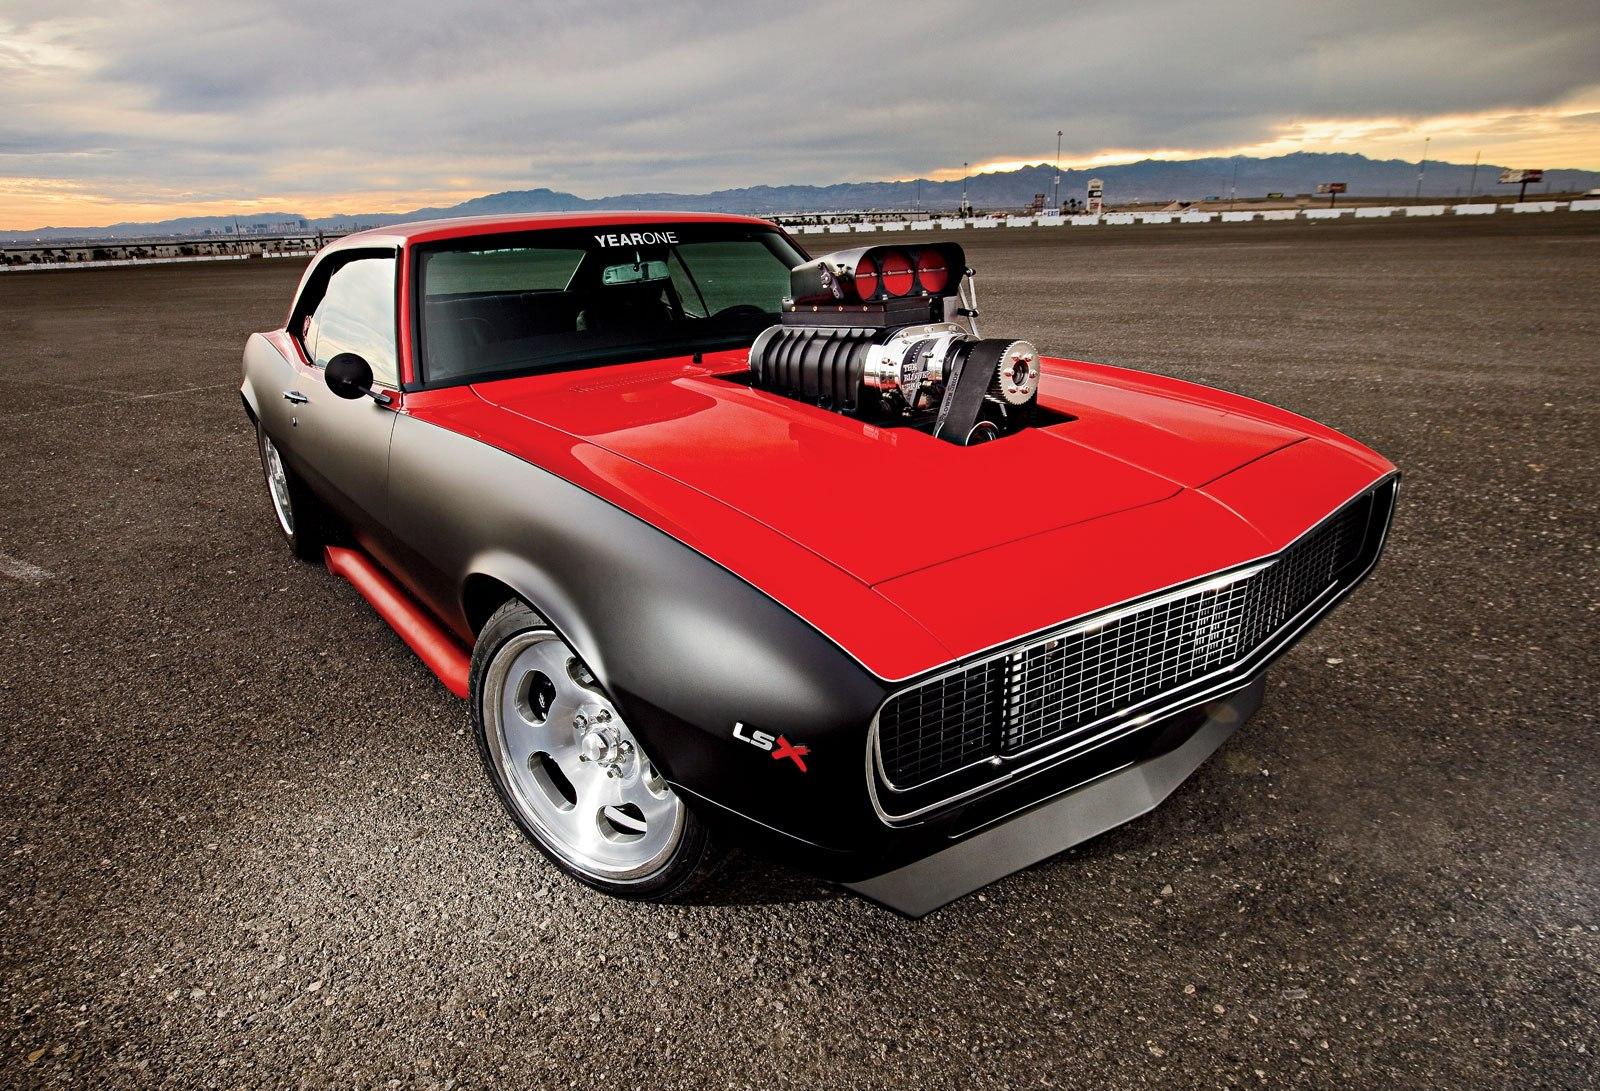 Hot Rod Intervention The Cherry Bomb 68 Camaro No Car No